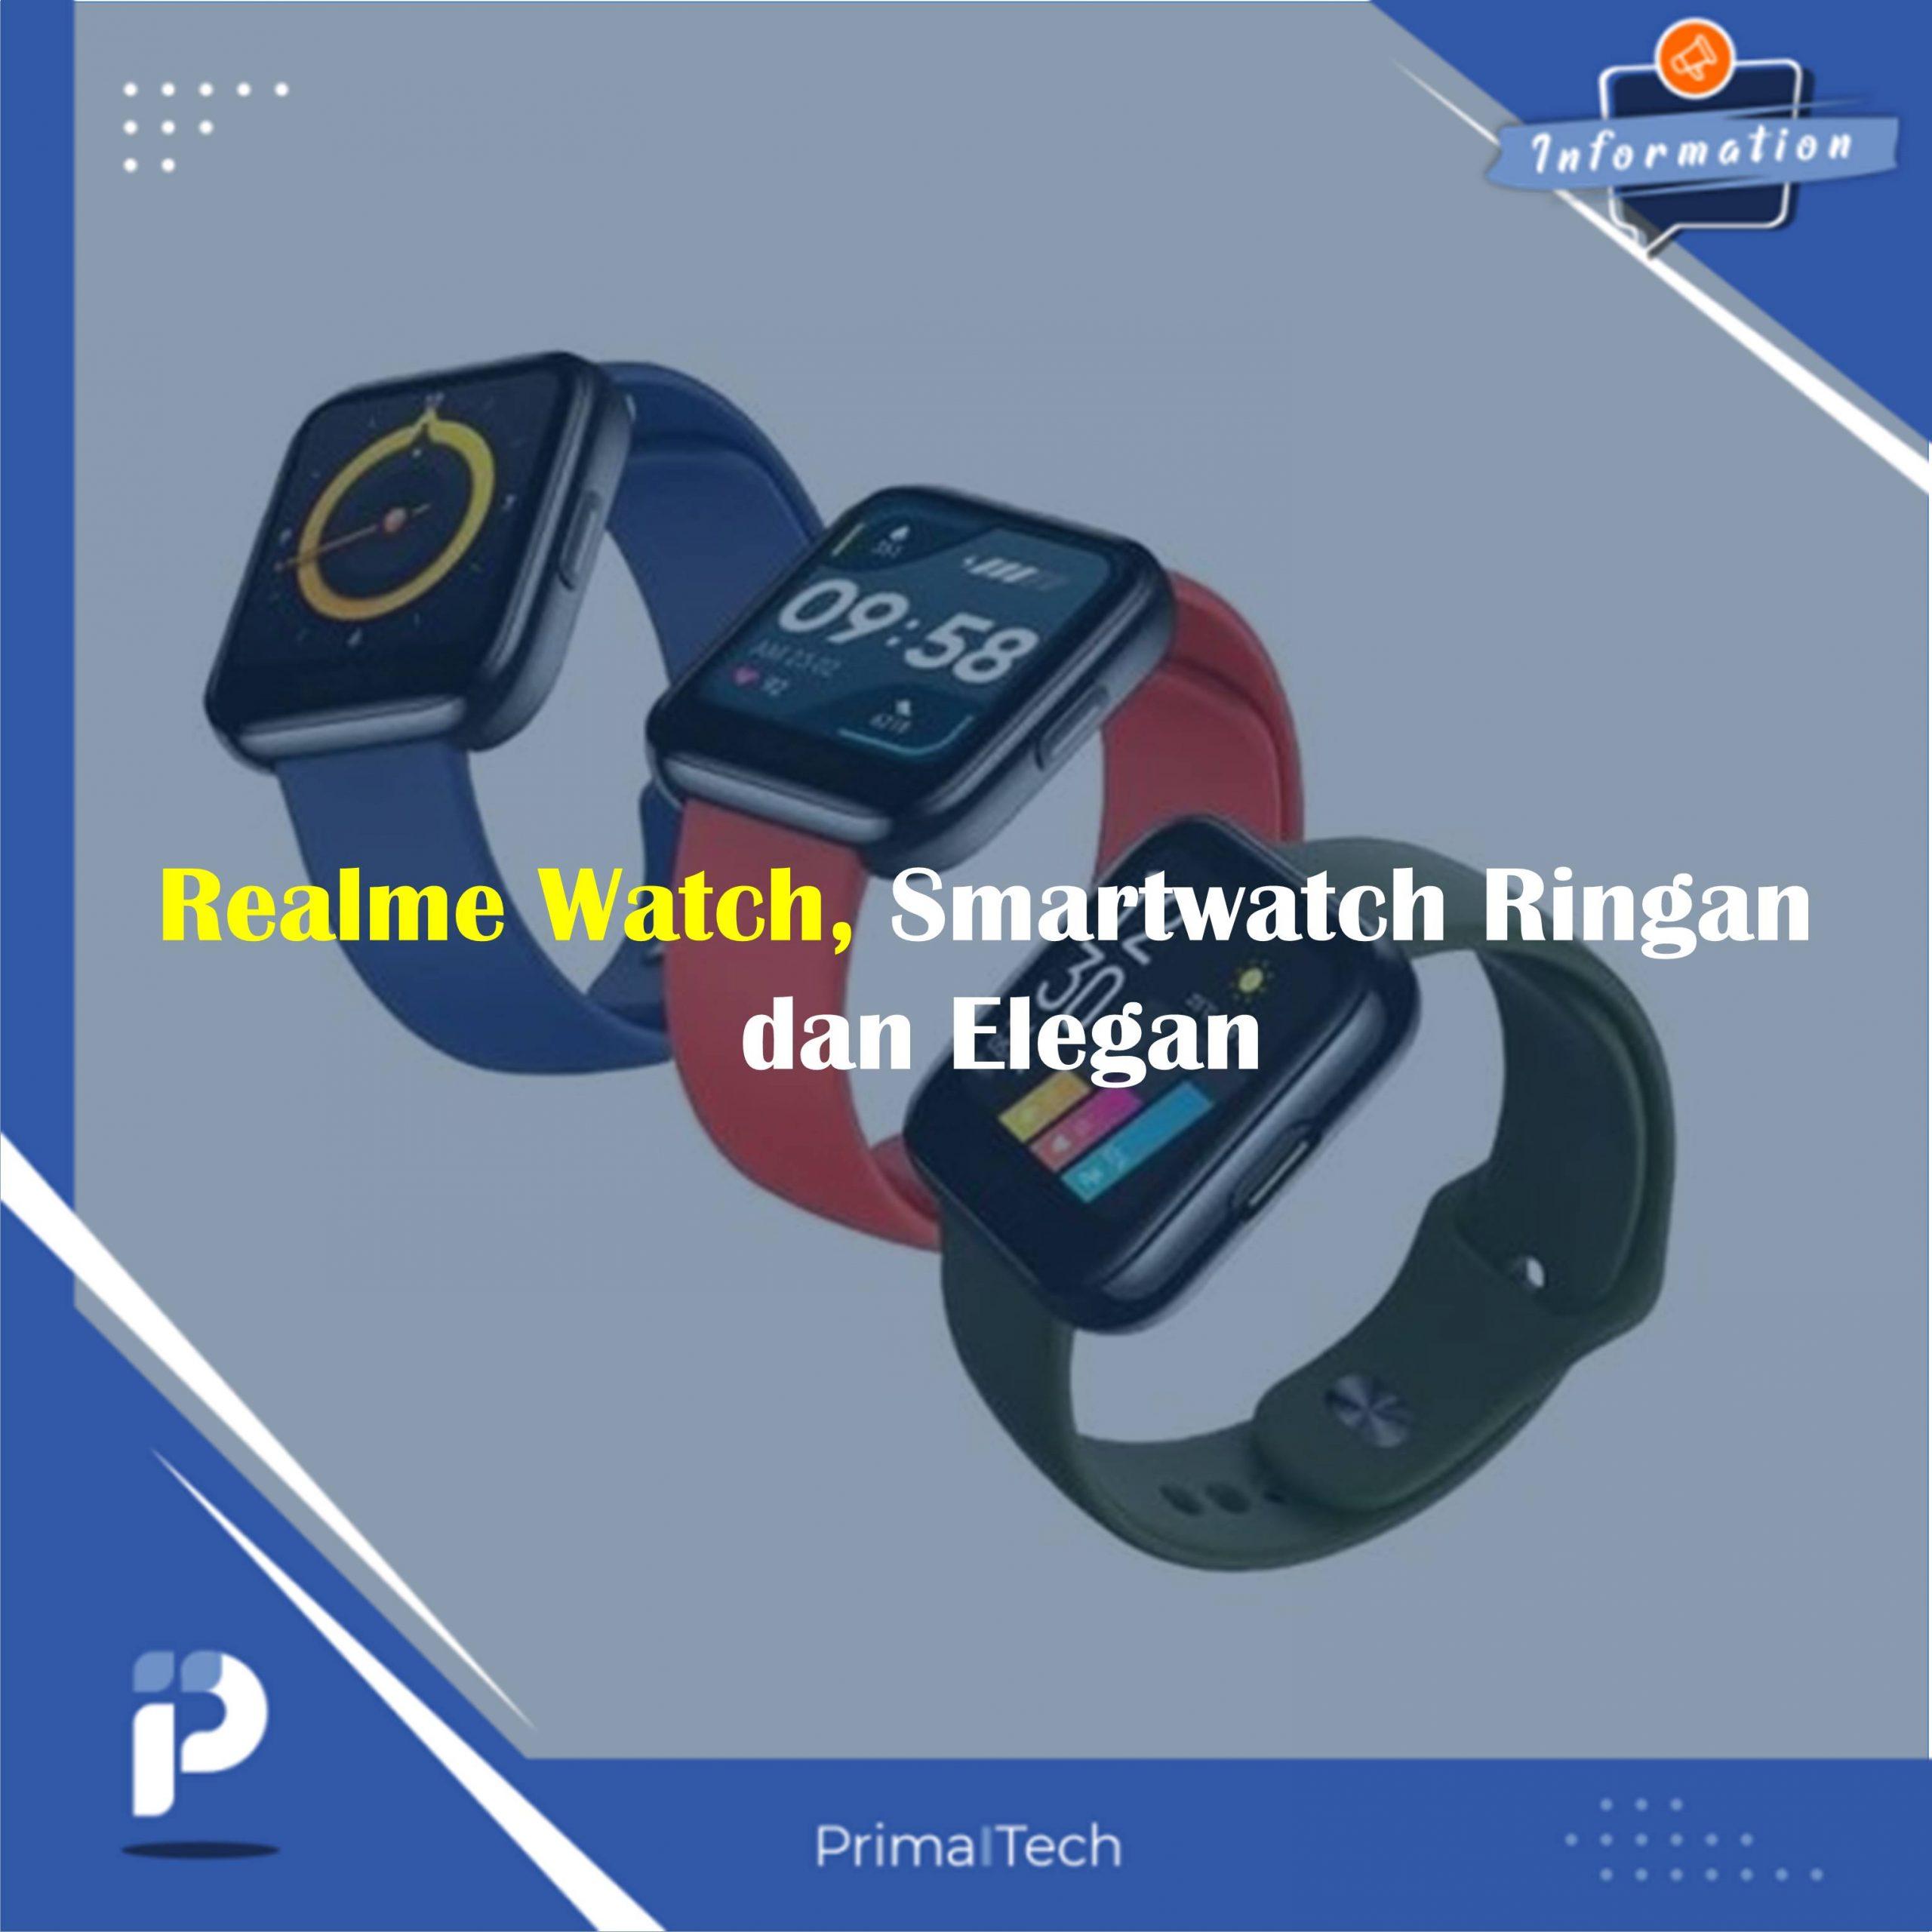 Realme Watch, Smartwatch Ringan dan Elegan